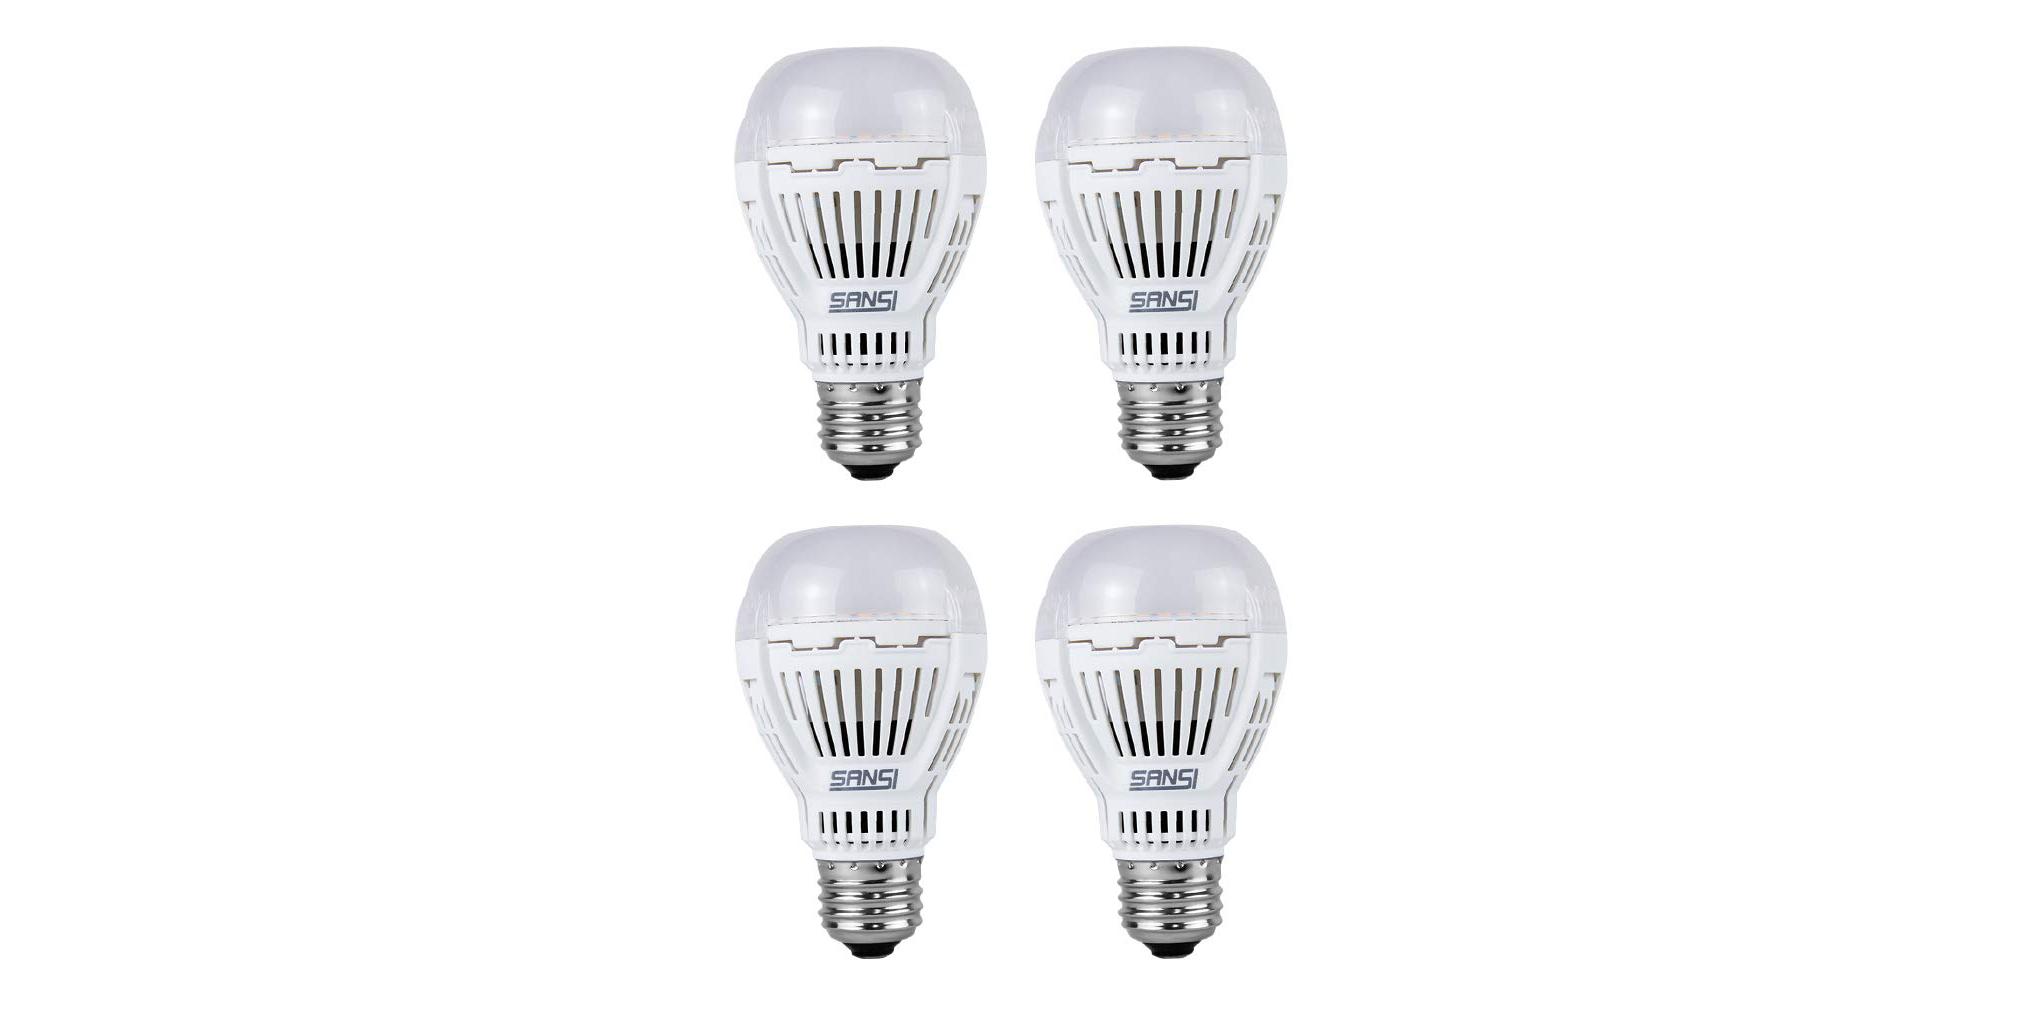 Green Deals: 4-pack 100W A19 LED Light Bulbs $20, more